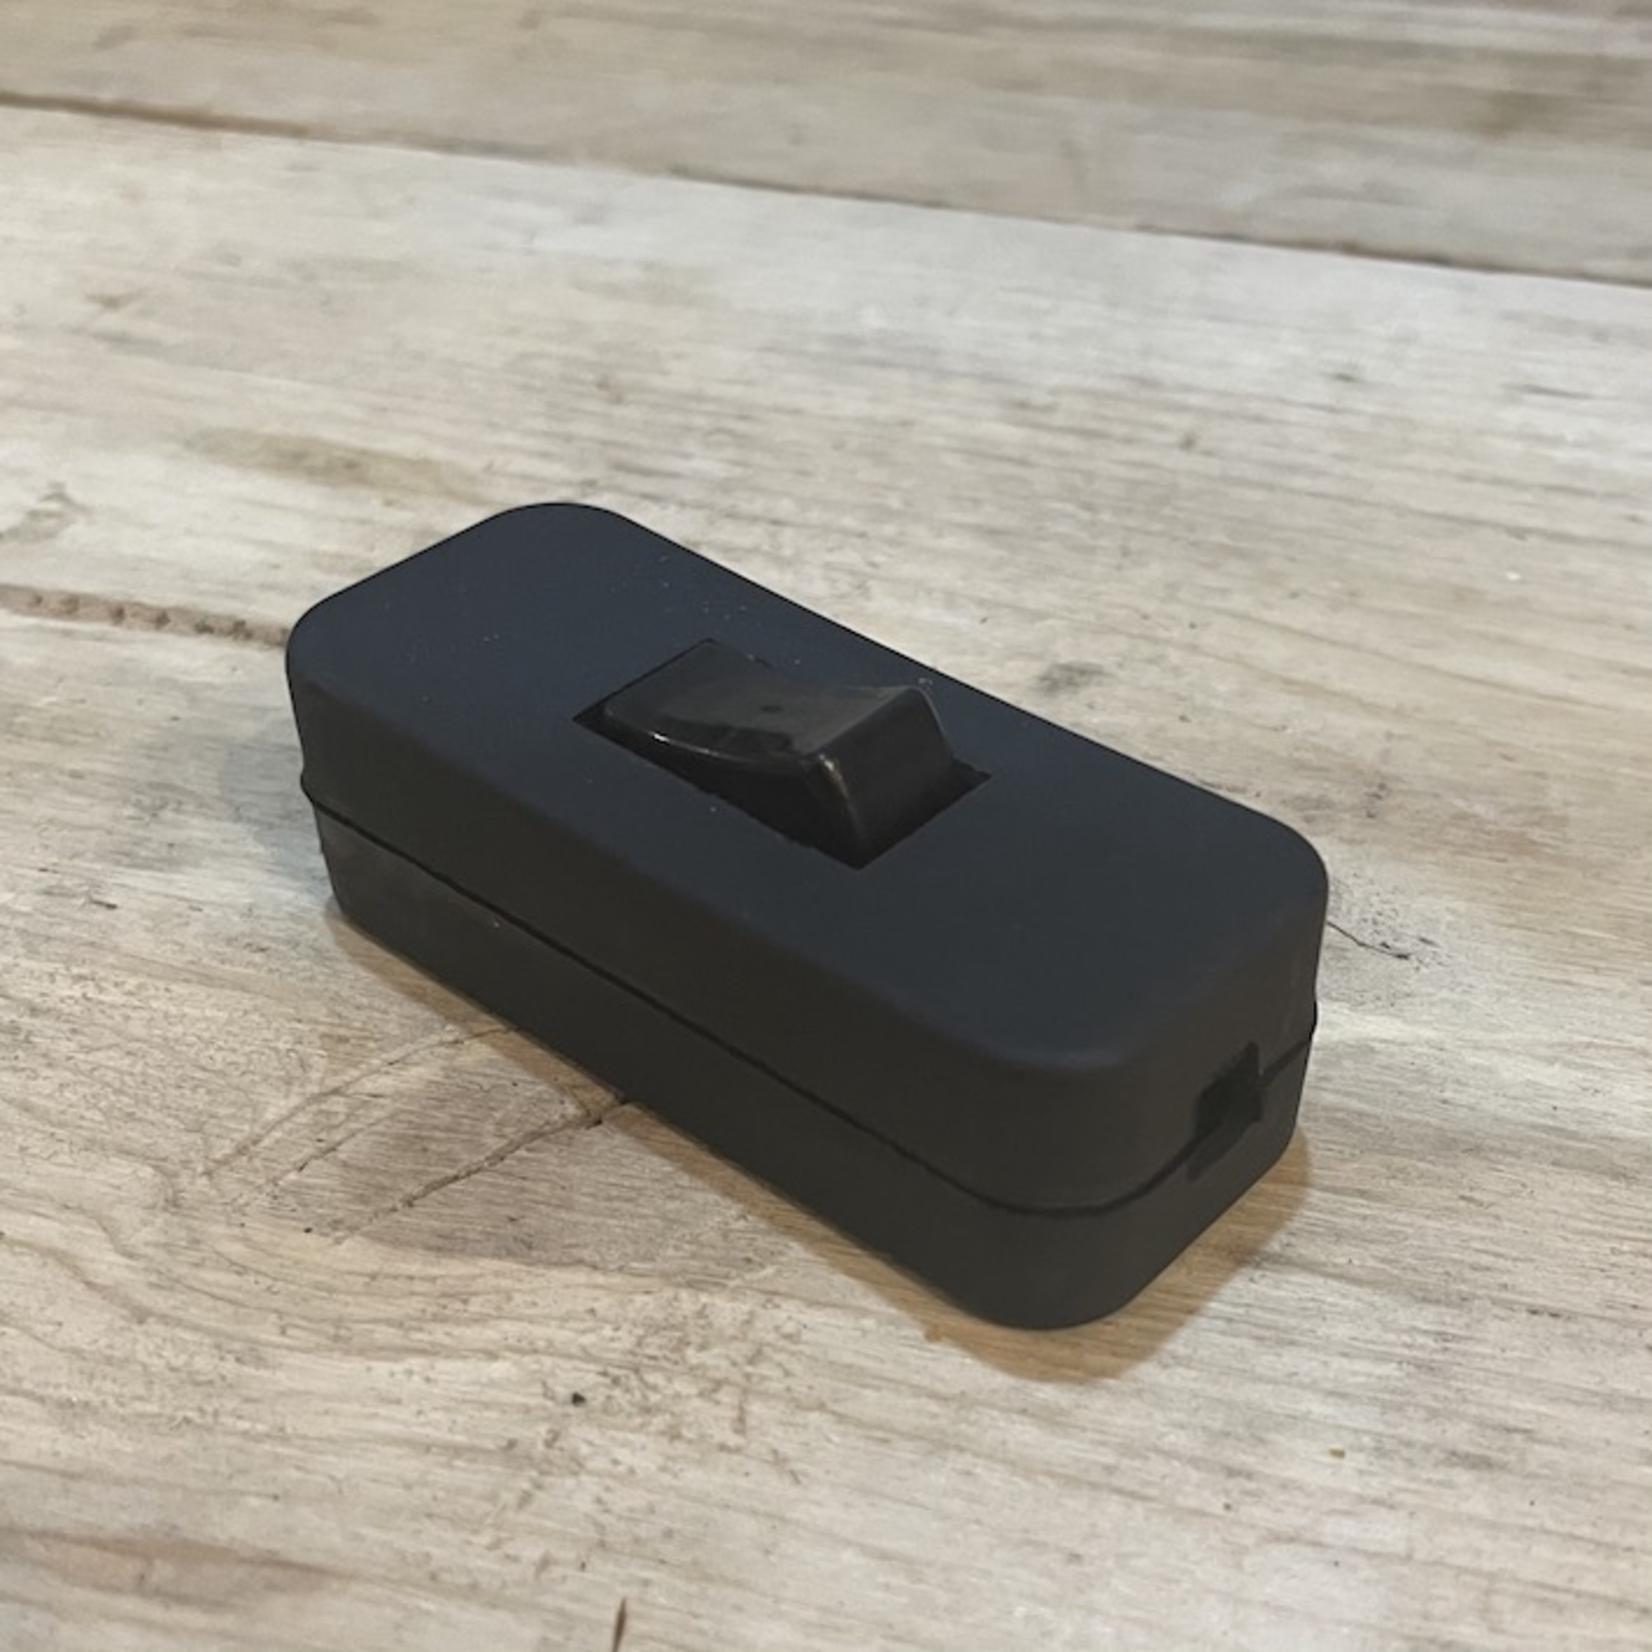 SL British Made Black Rocker Switch 2A 250V L6.5cm x W2.8cm x D2.5cm